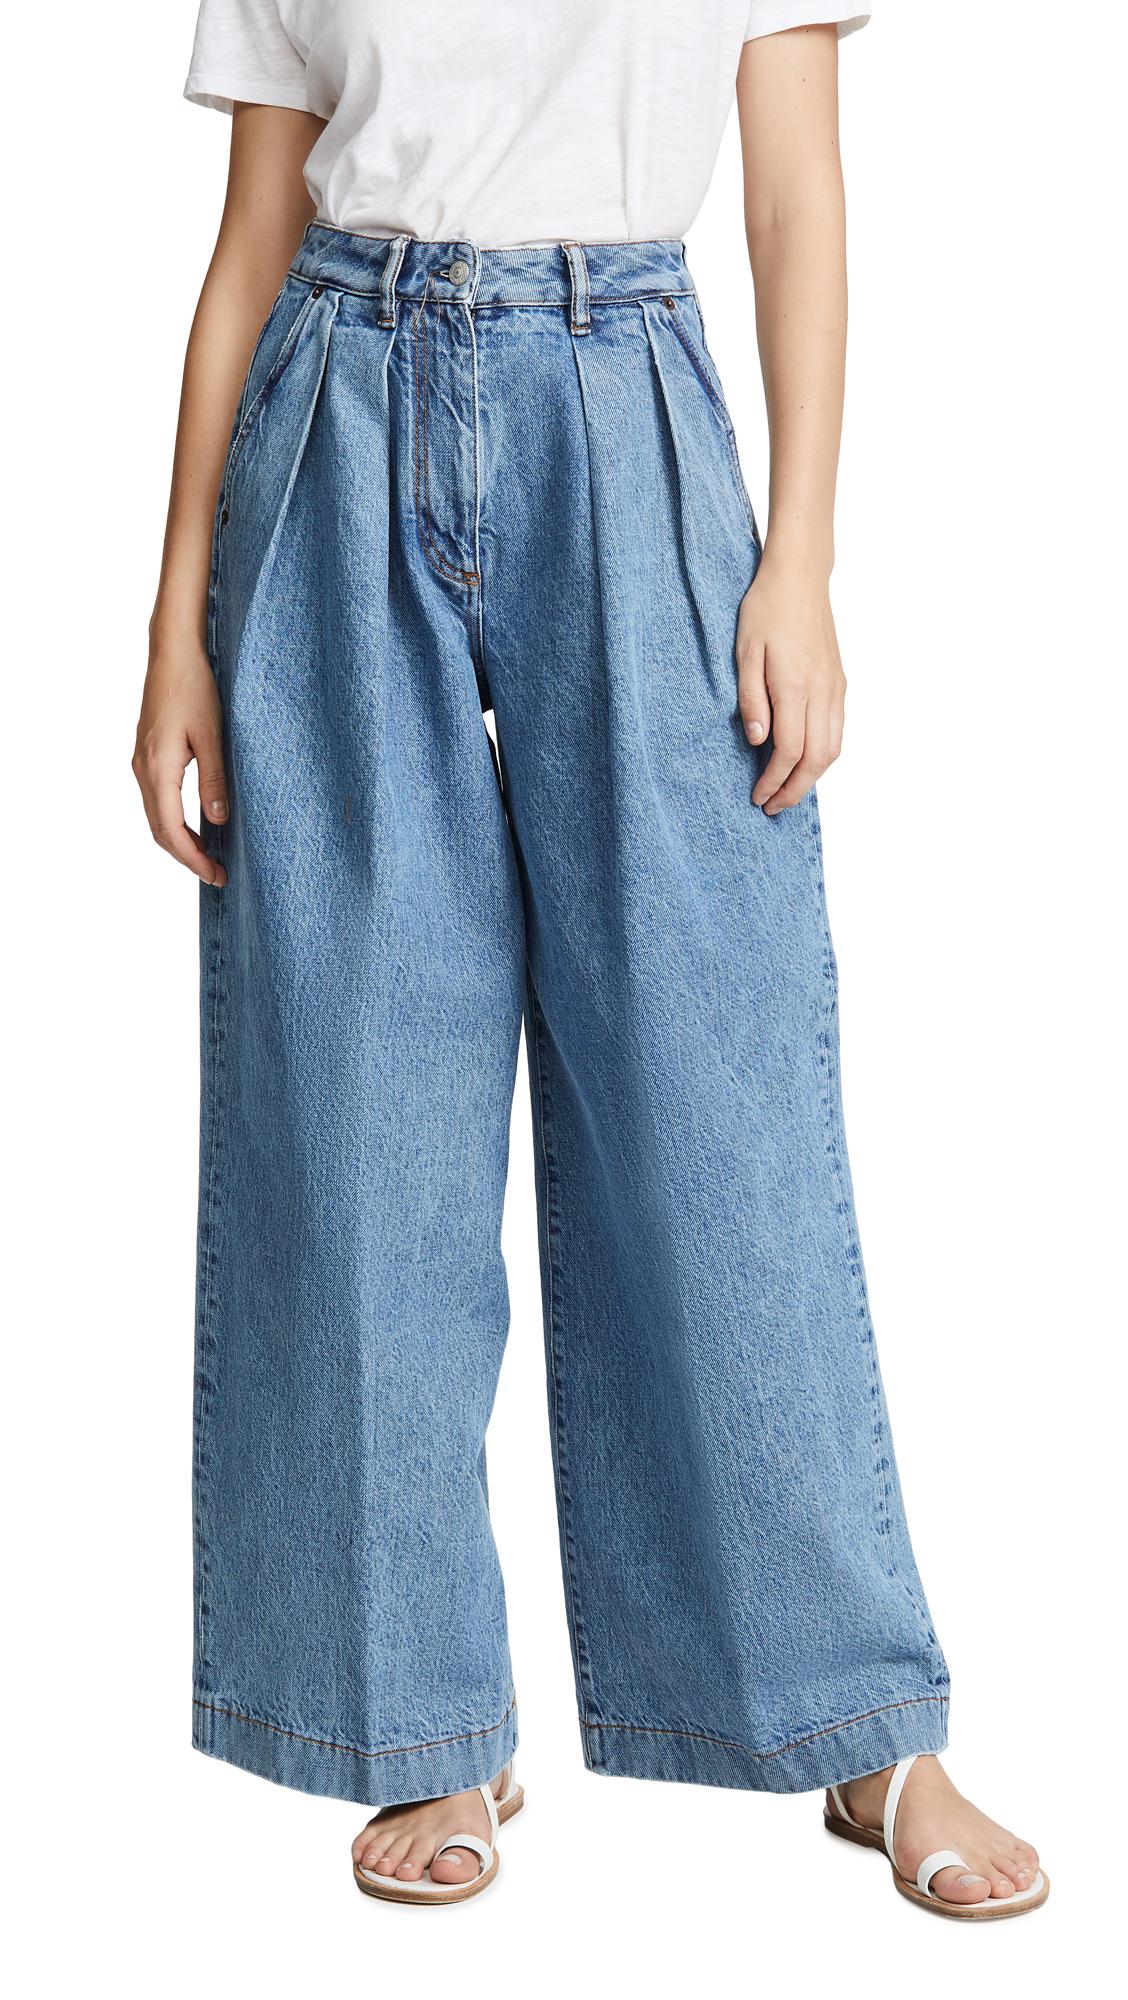 Acne Studios Pakita Blue Trousers - Light Blue